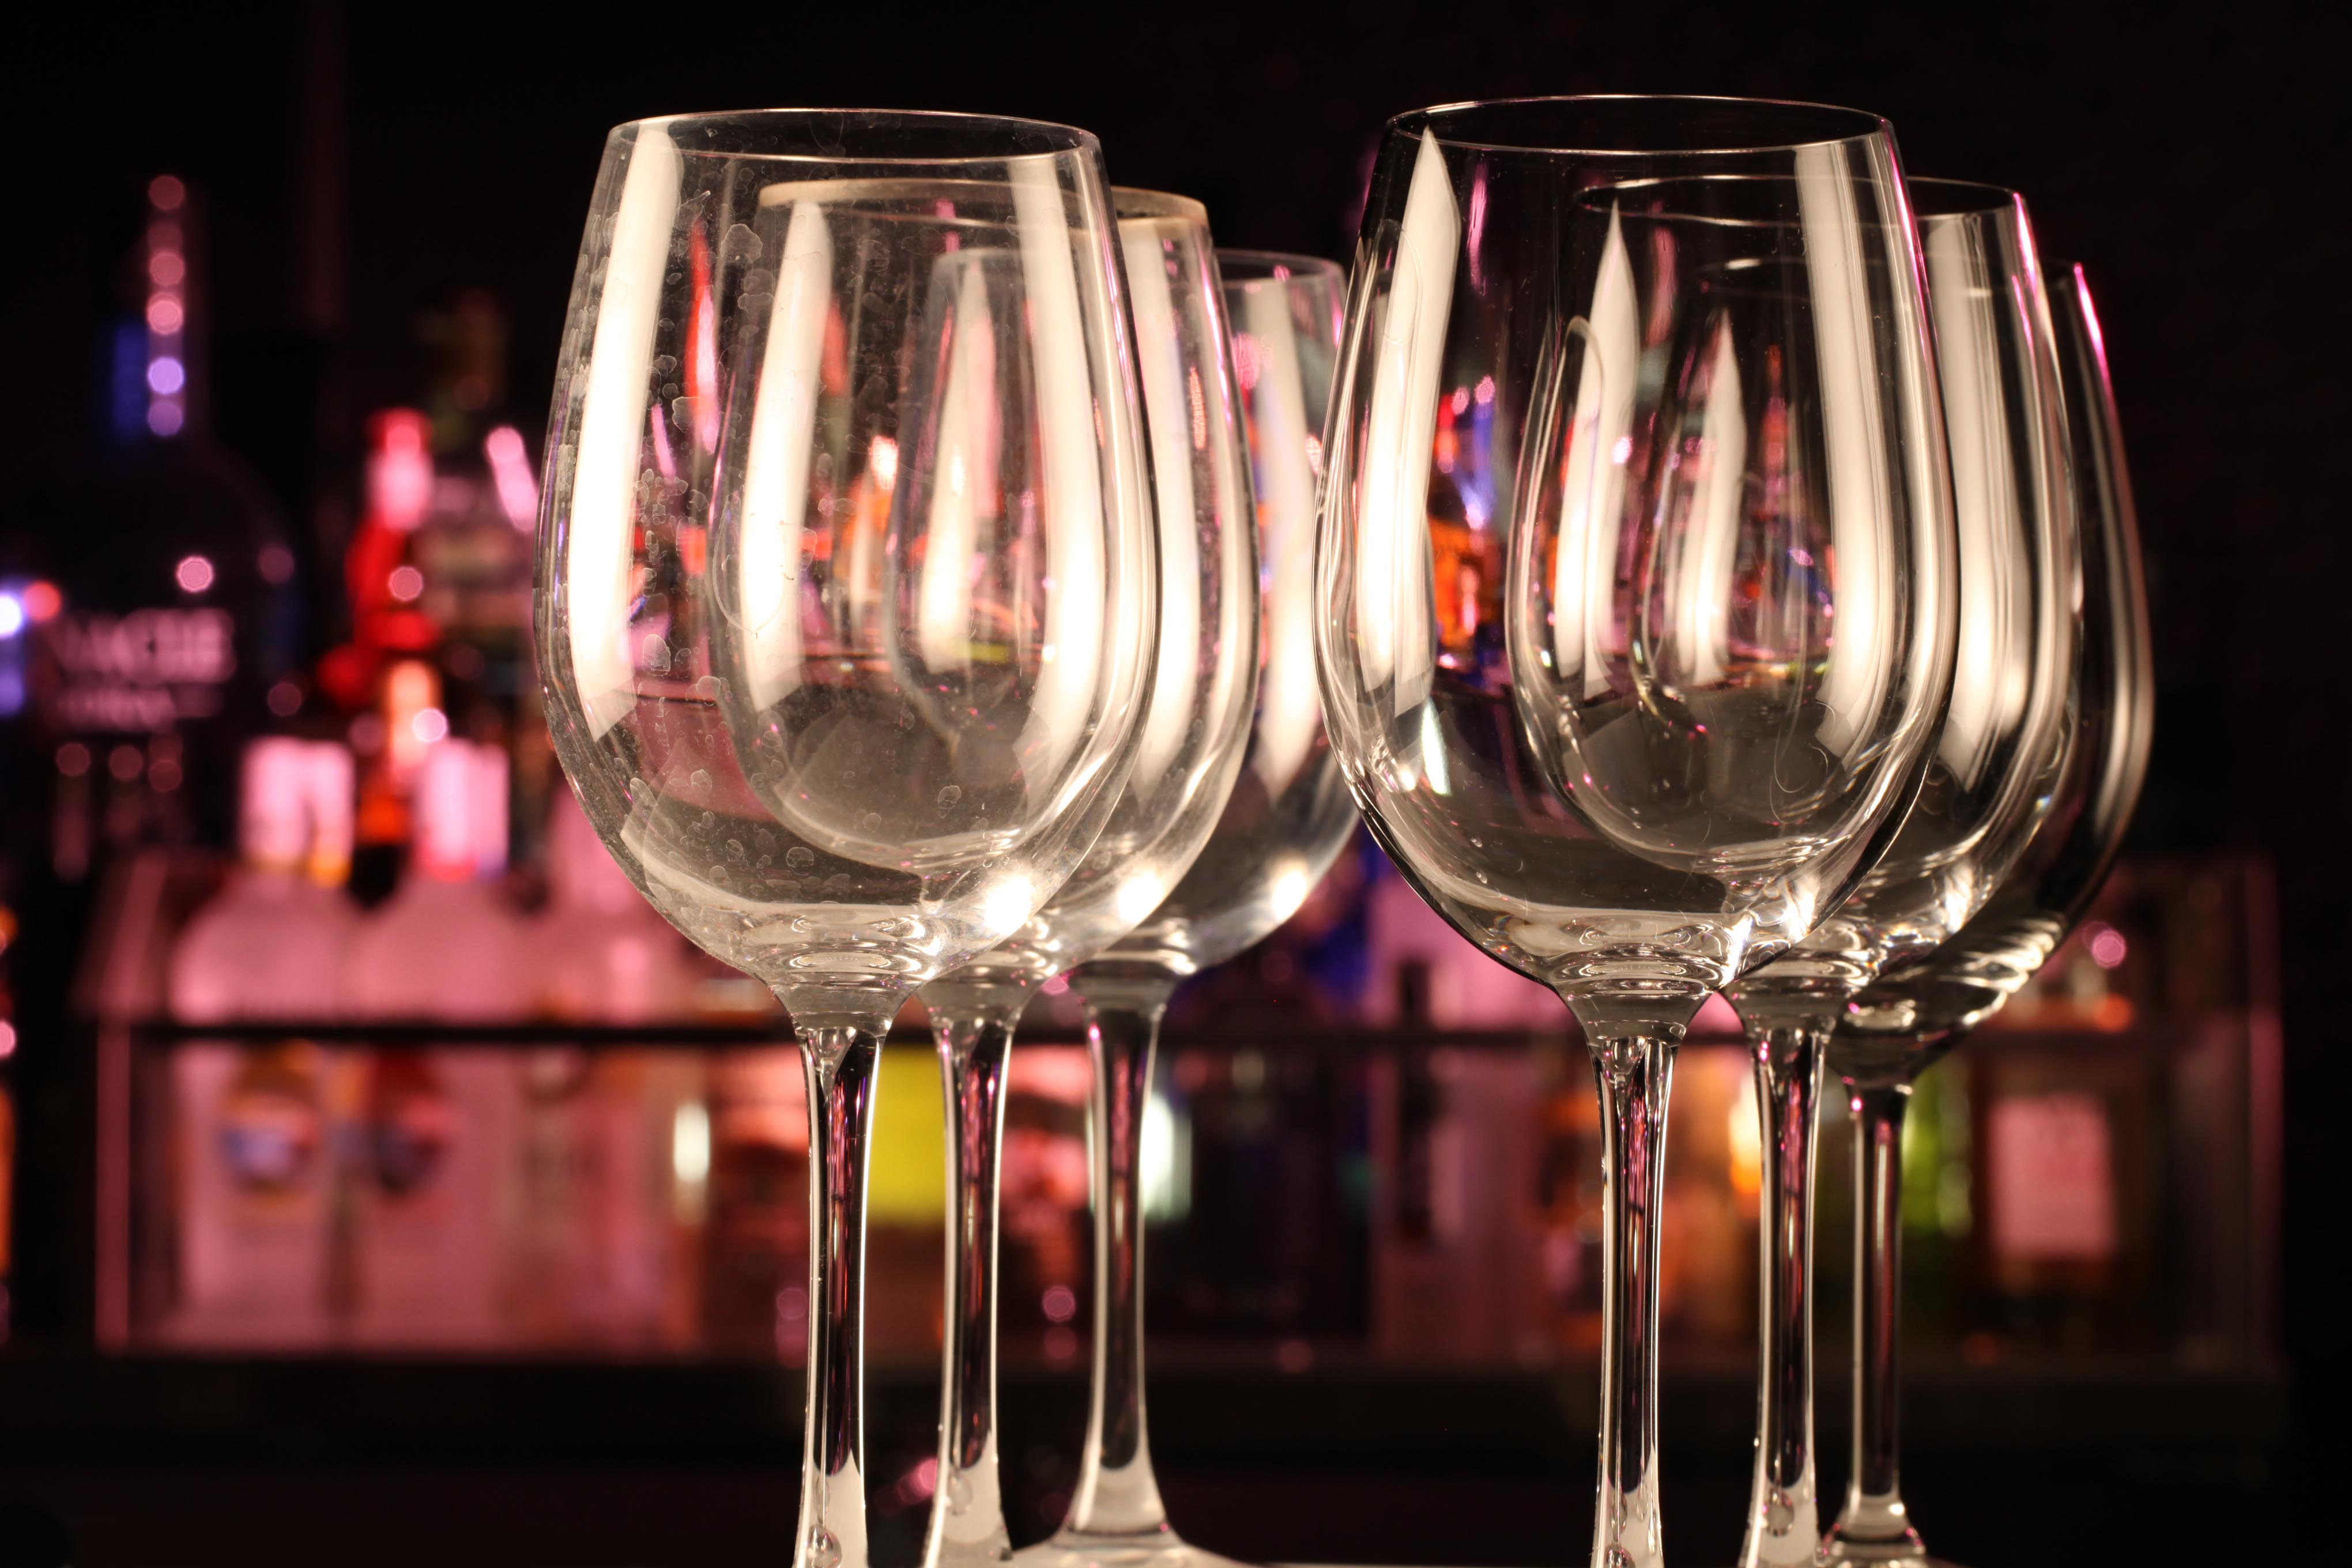 Best Dishwasher For Wine Glasses Wine Glass Cleaning Using Dishwashers